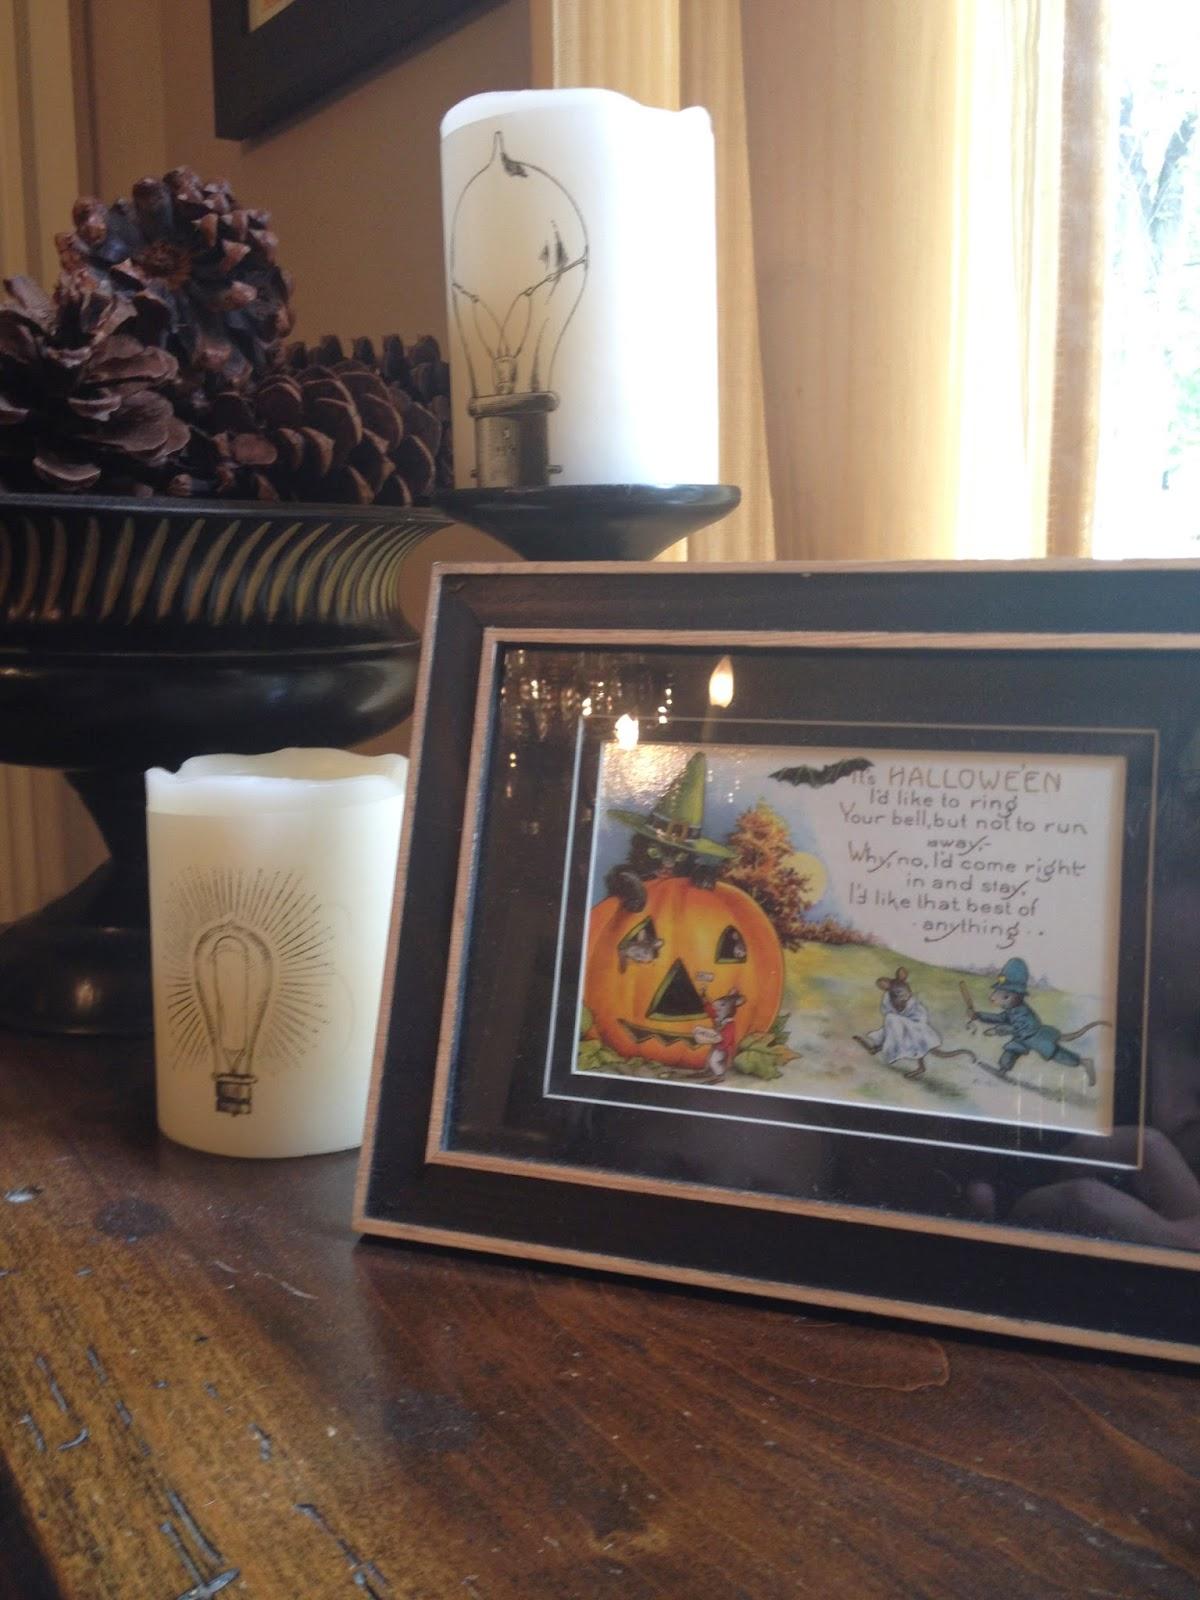 Frame Vintage Halloween Cards for Halloween